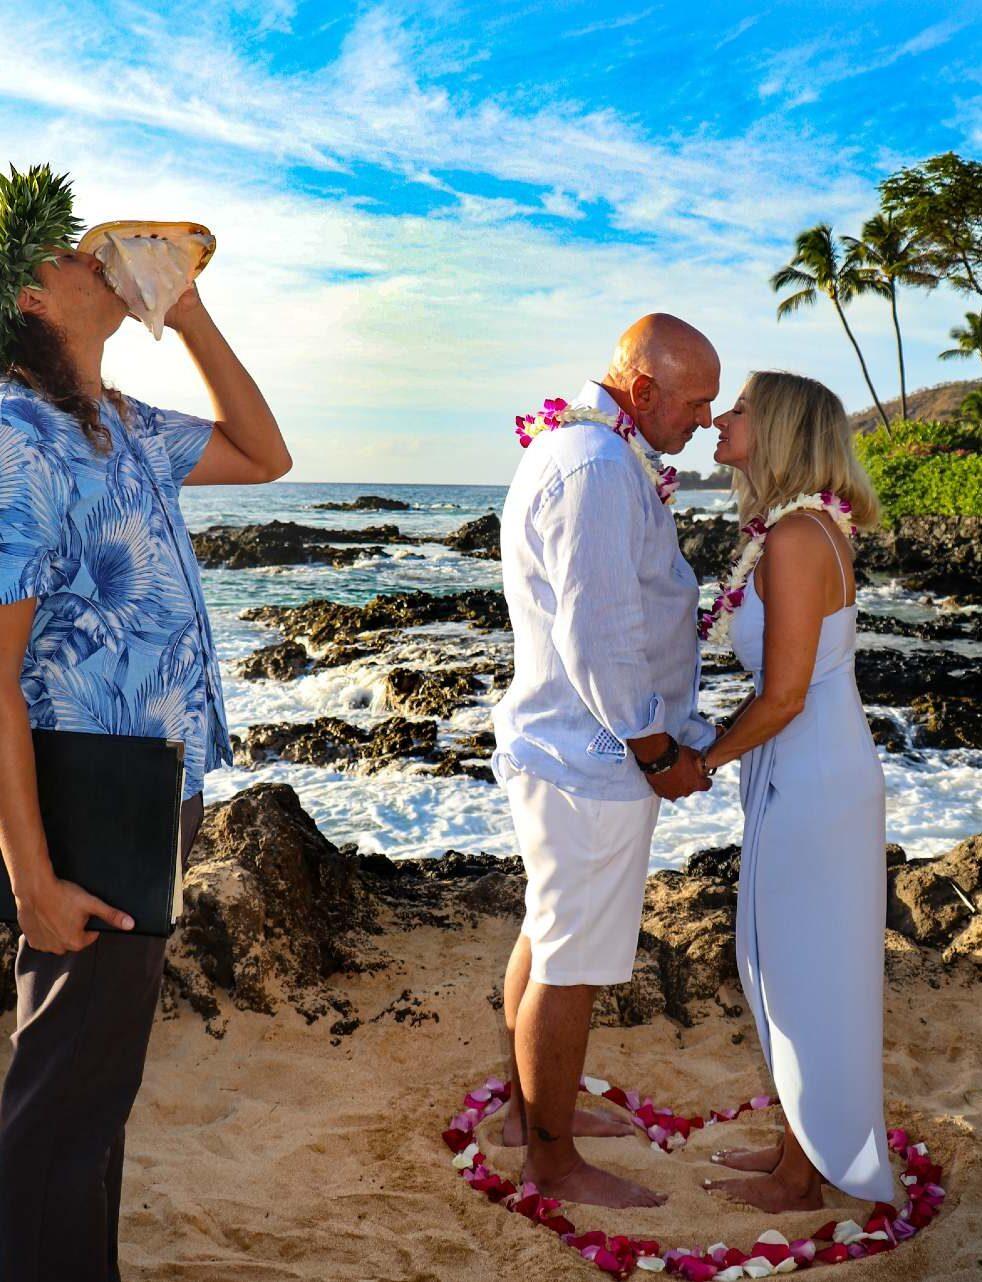 Maui wedding planner Shane